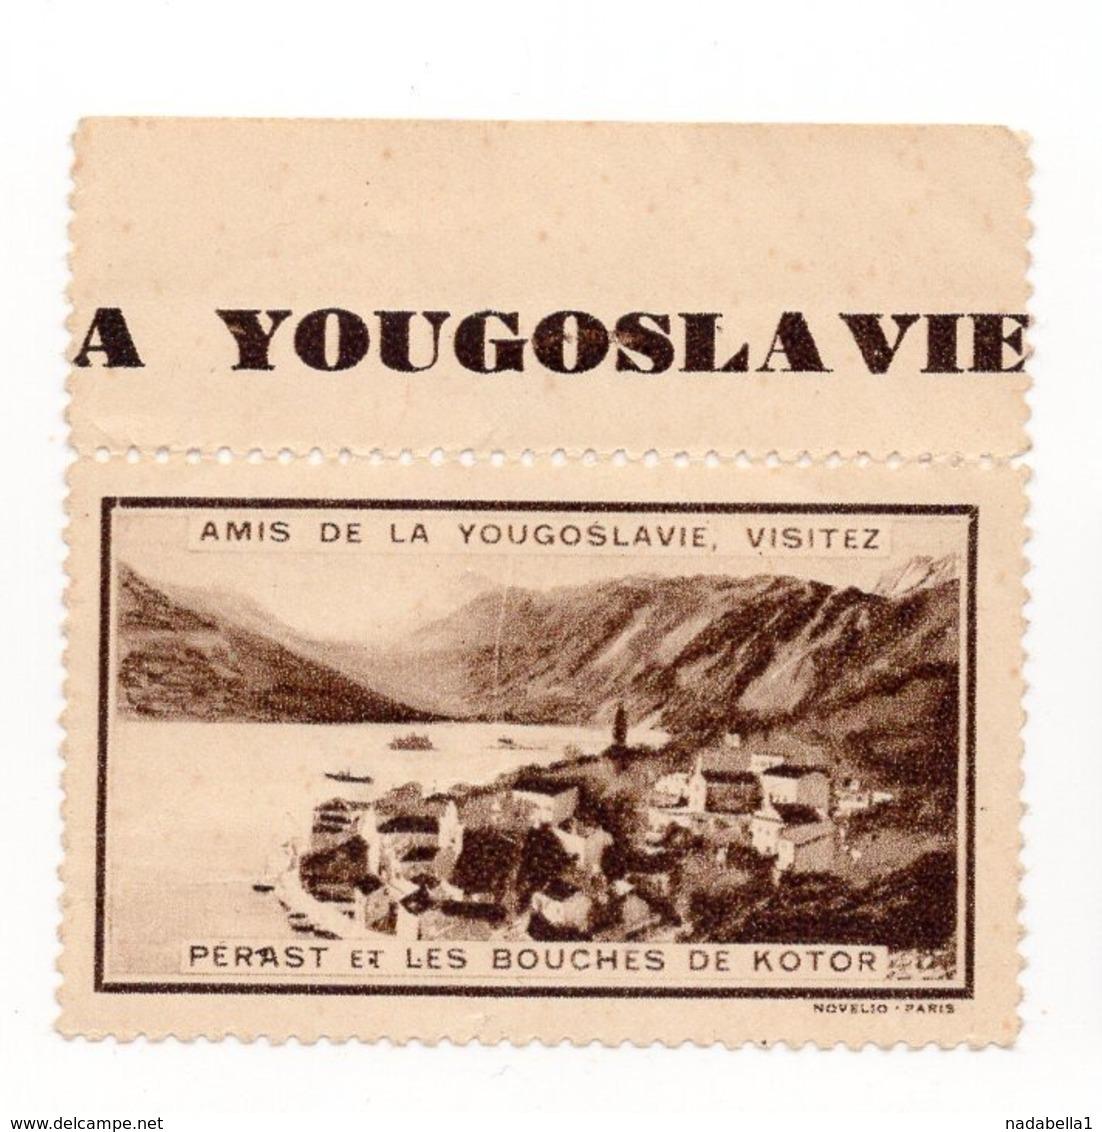 YUGOSLAVIA, MONTENEGRO, KOTOR, 1930? POSTER STAMP,  DIMENSIONS 5.2 X 4 Cm - Montenegro